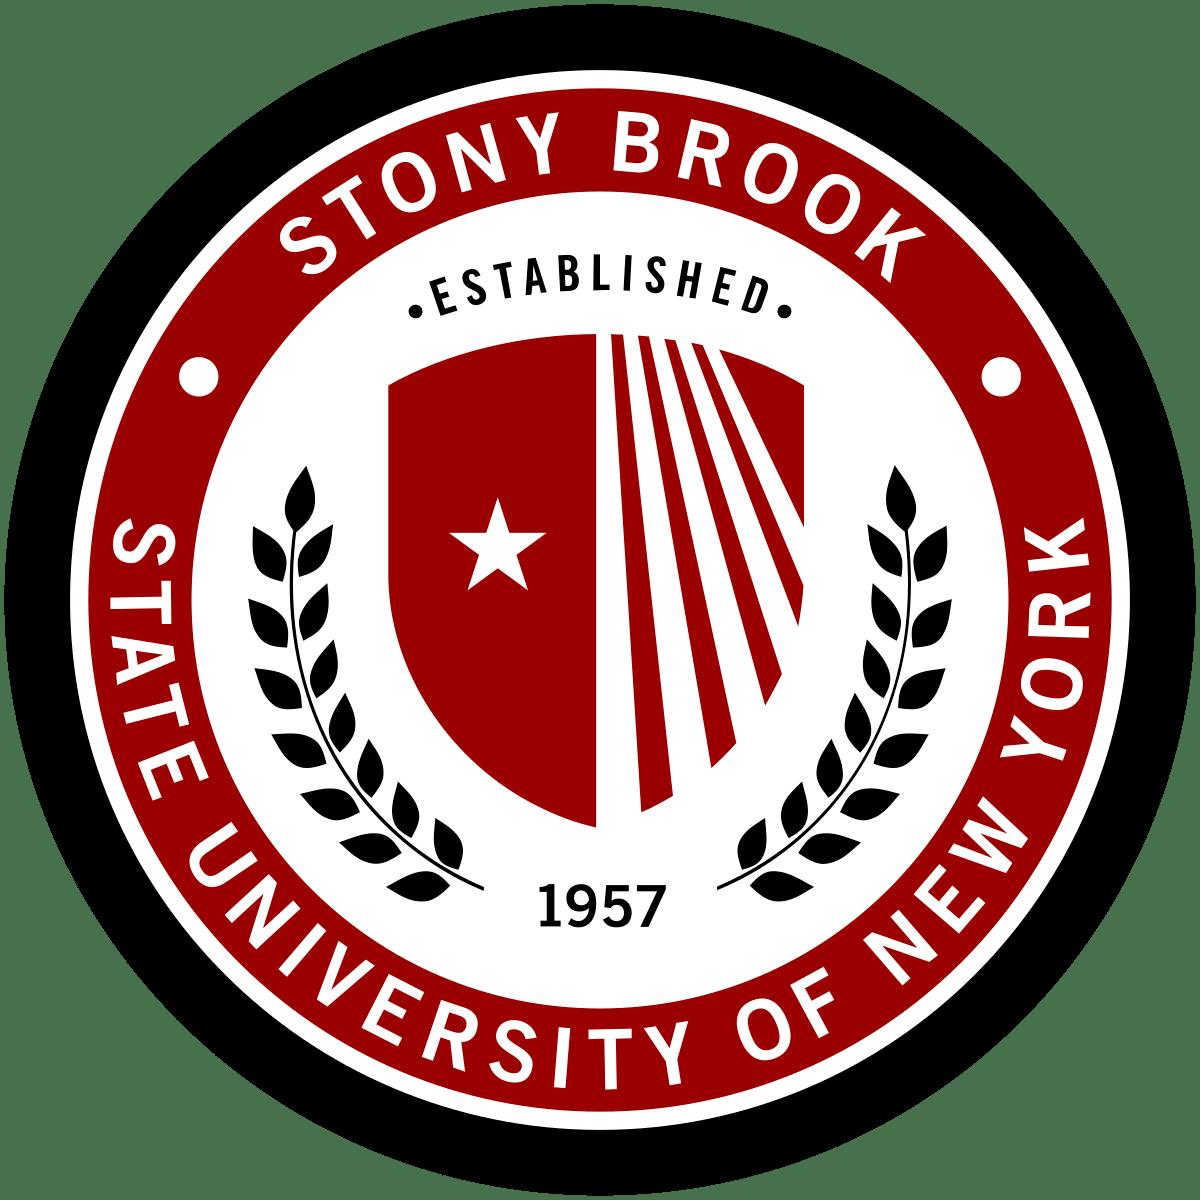 Stony Brook State University of New York